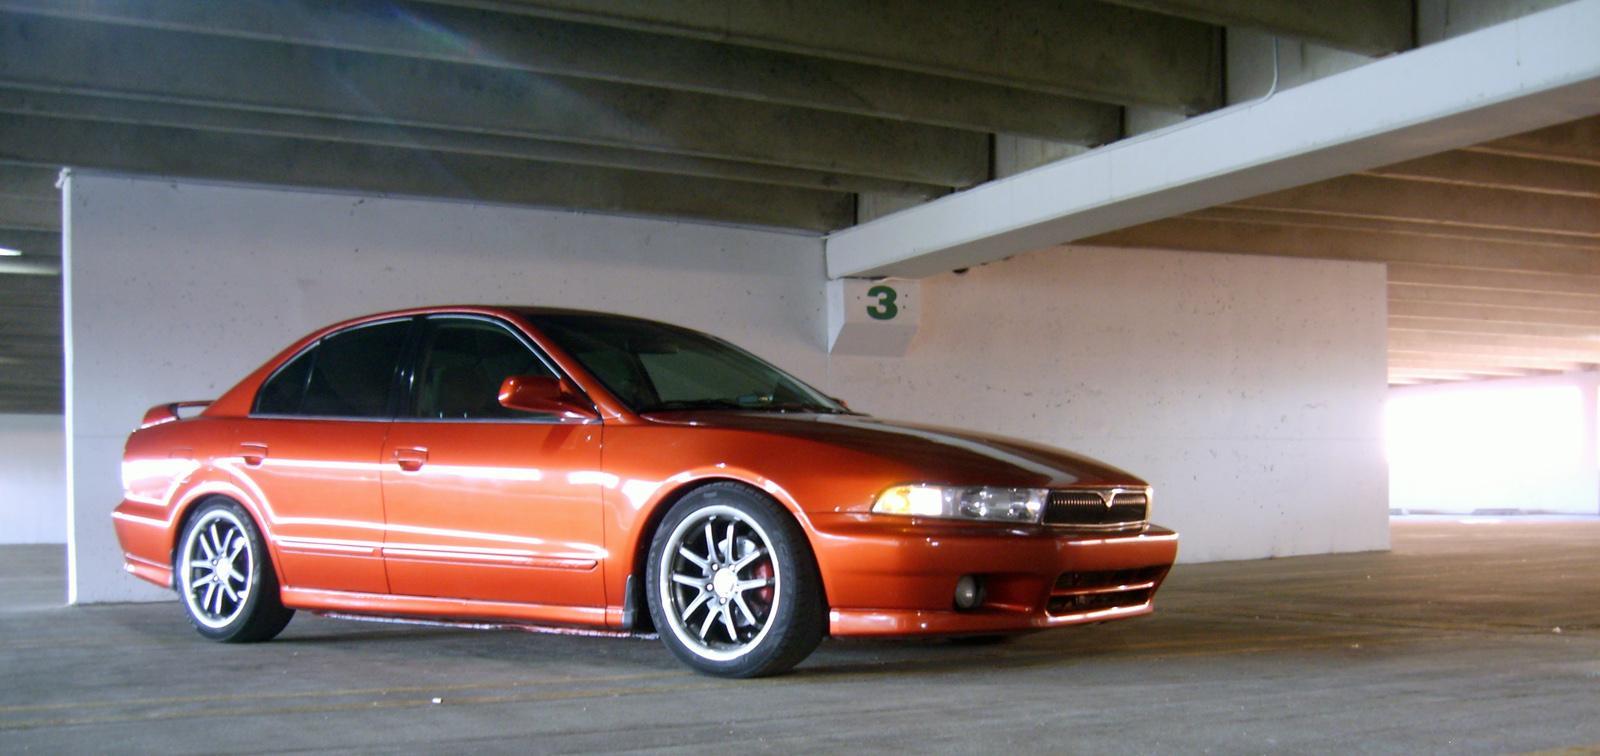 2001 mitsubishi galant 6 mitsubishi galant 6 800 1024 1280 1600 origin - Mitsubishi Galant 2001 Custom